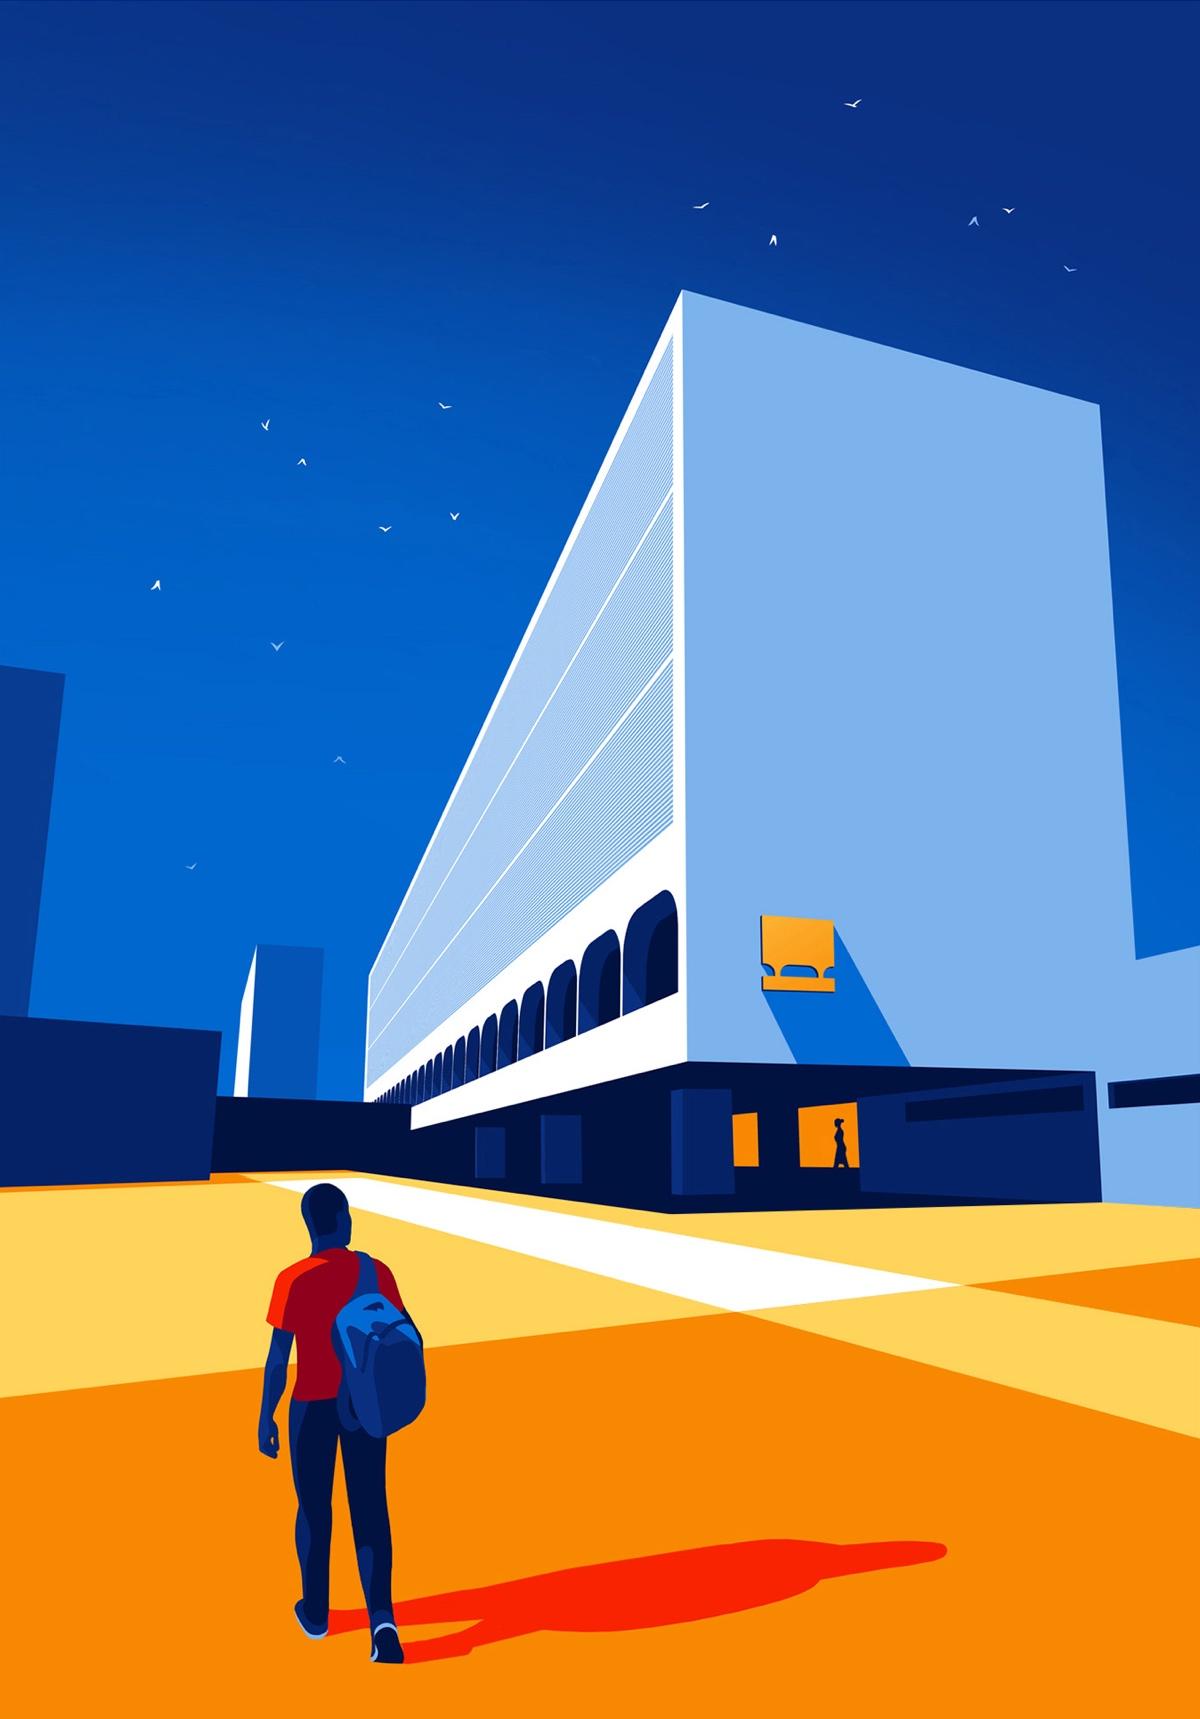 oscar-niemeyer-architecture-illustrations-levente-szabo-2